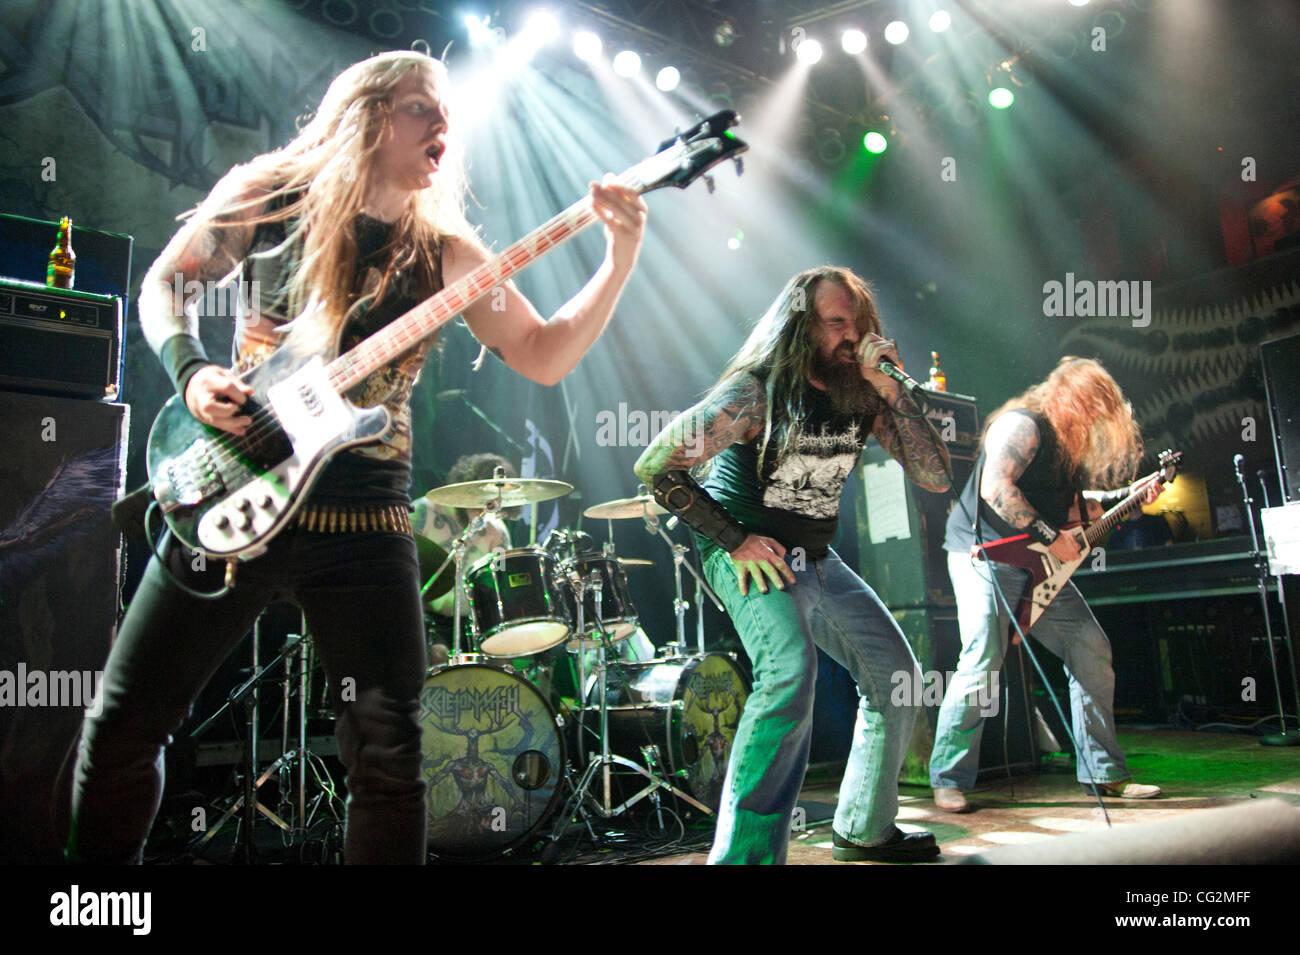 October 4, 2011 - Chicago, IL, USA - Scott Hedrick (left), Dustin Boltjes (Back), Chance Garnette (center), and - Stock Image